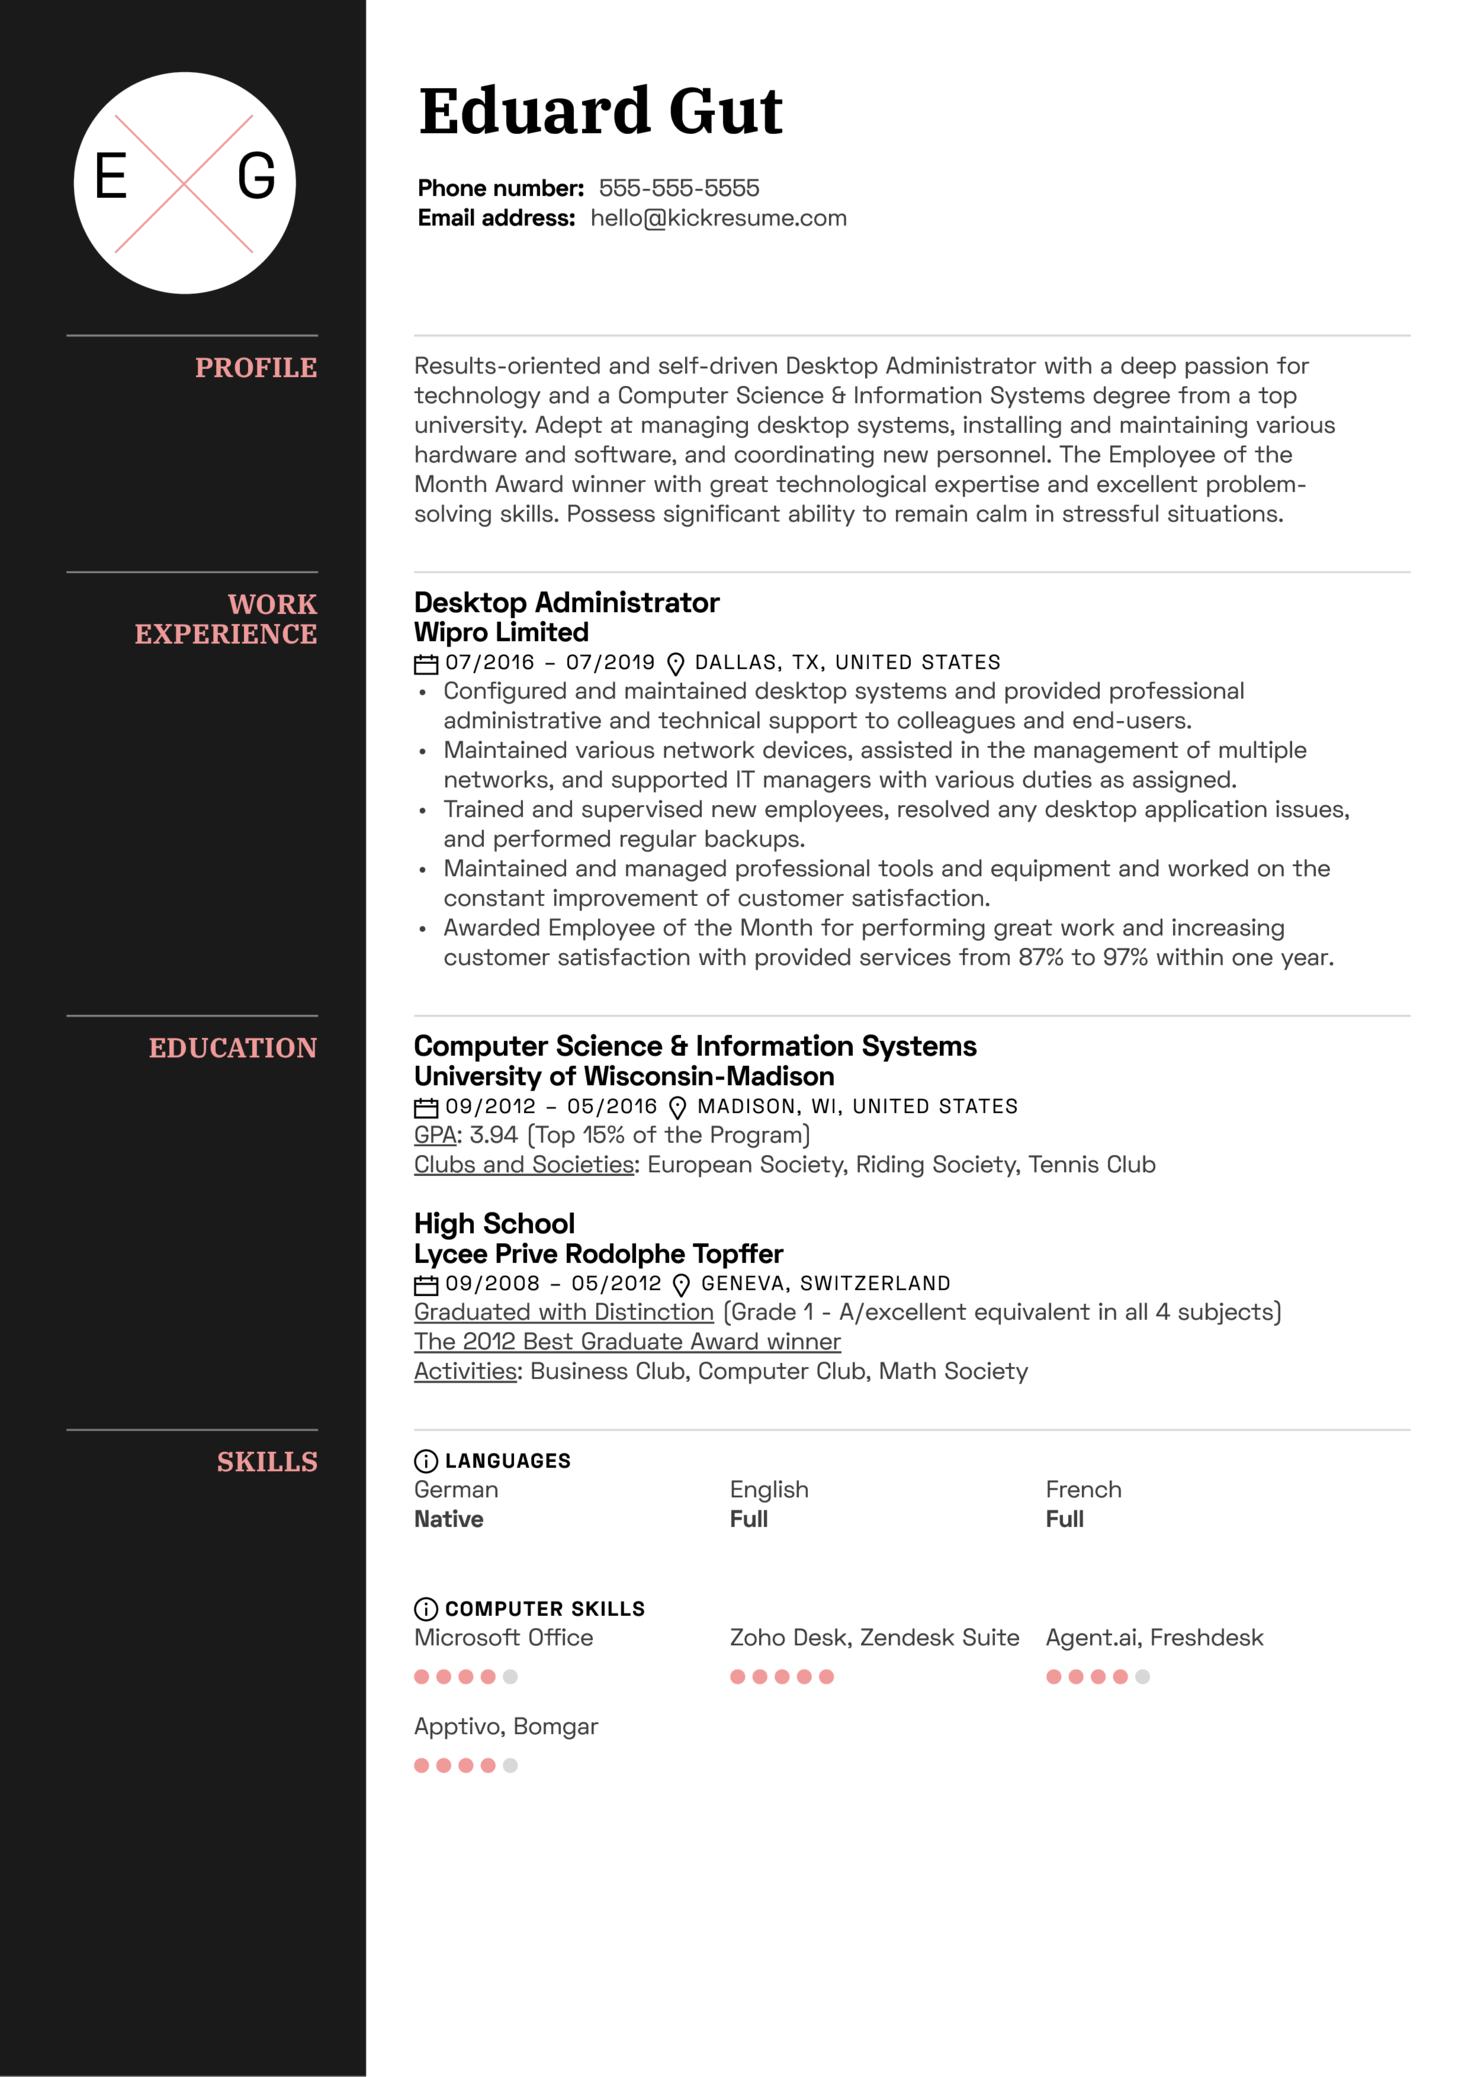 Desktop Administrator Resume Sample (Part 1)